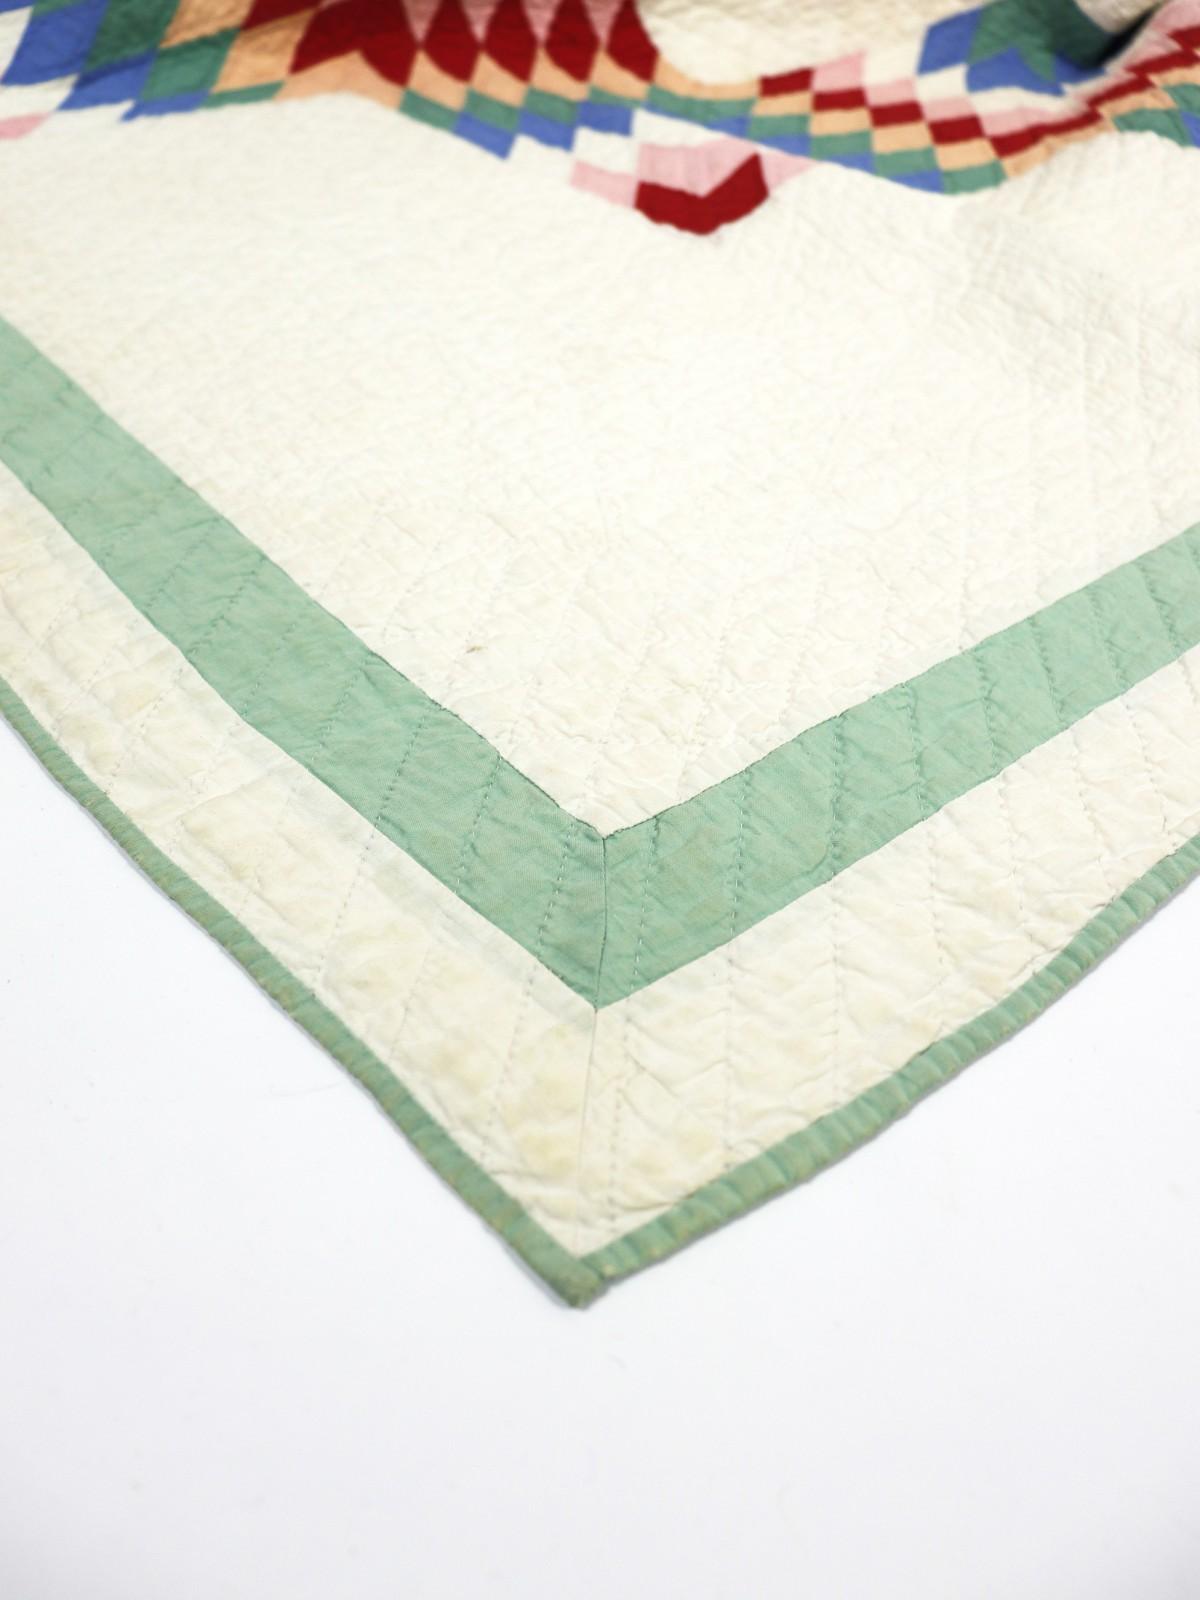 Antique, handmade quilt, USA,1900's, BROWN.